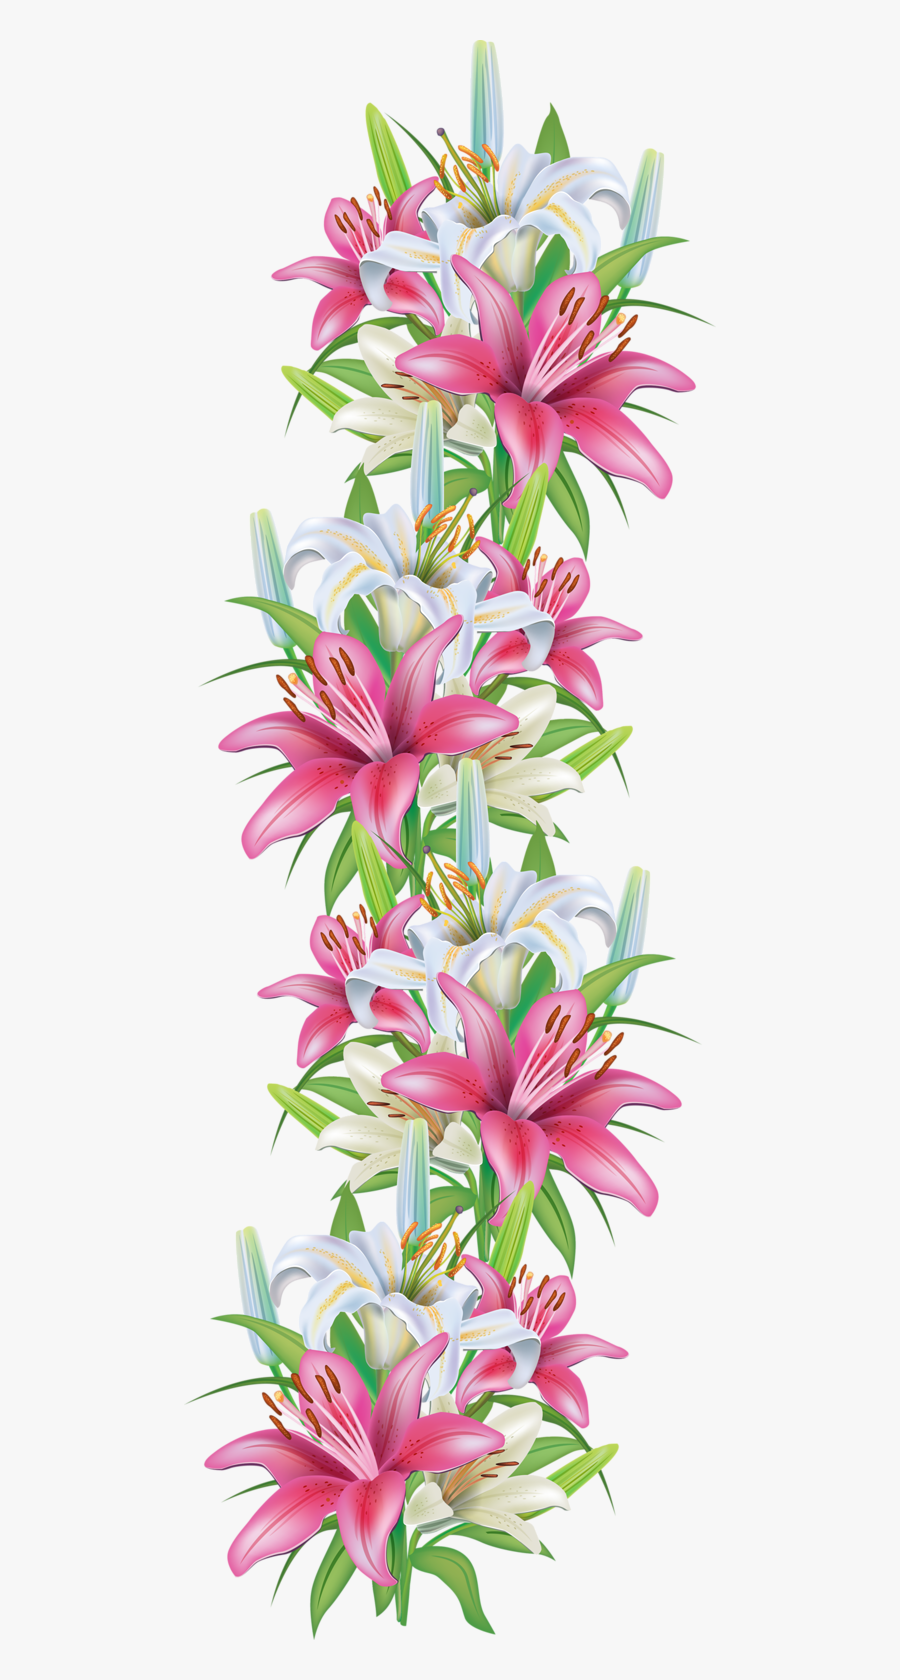 Transparent Lily Flower Png - Pink Lily Flower Border, Transparent Clipart